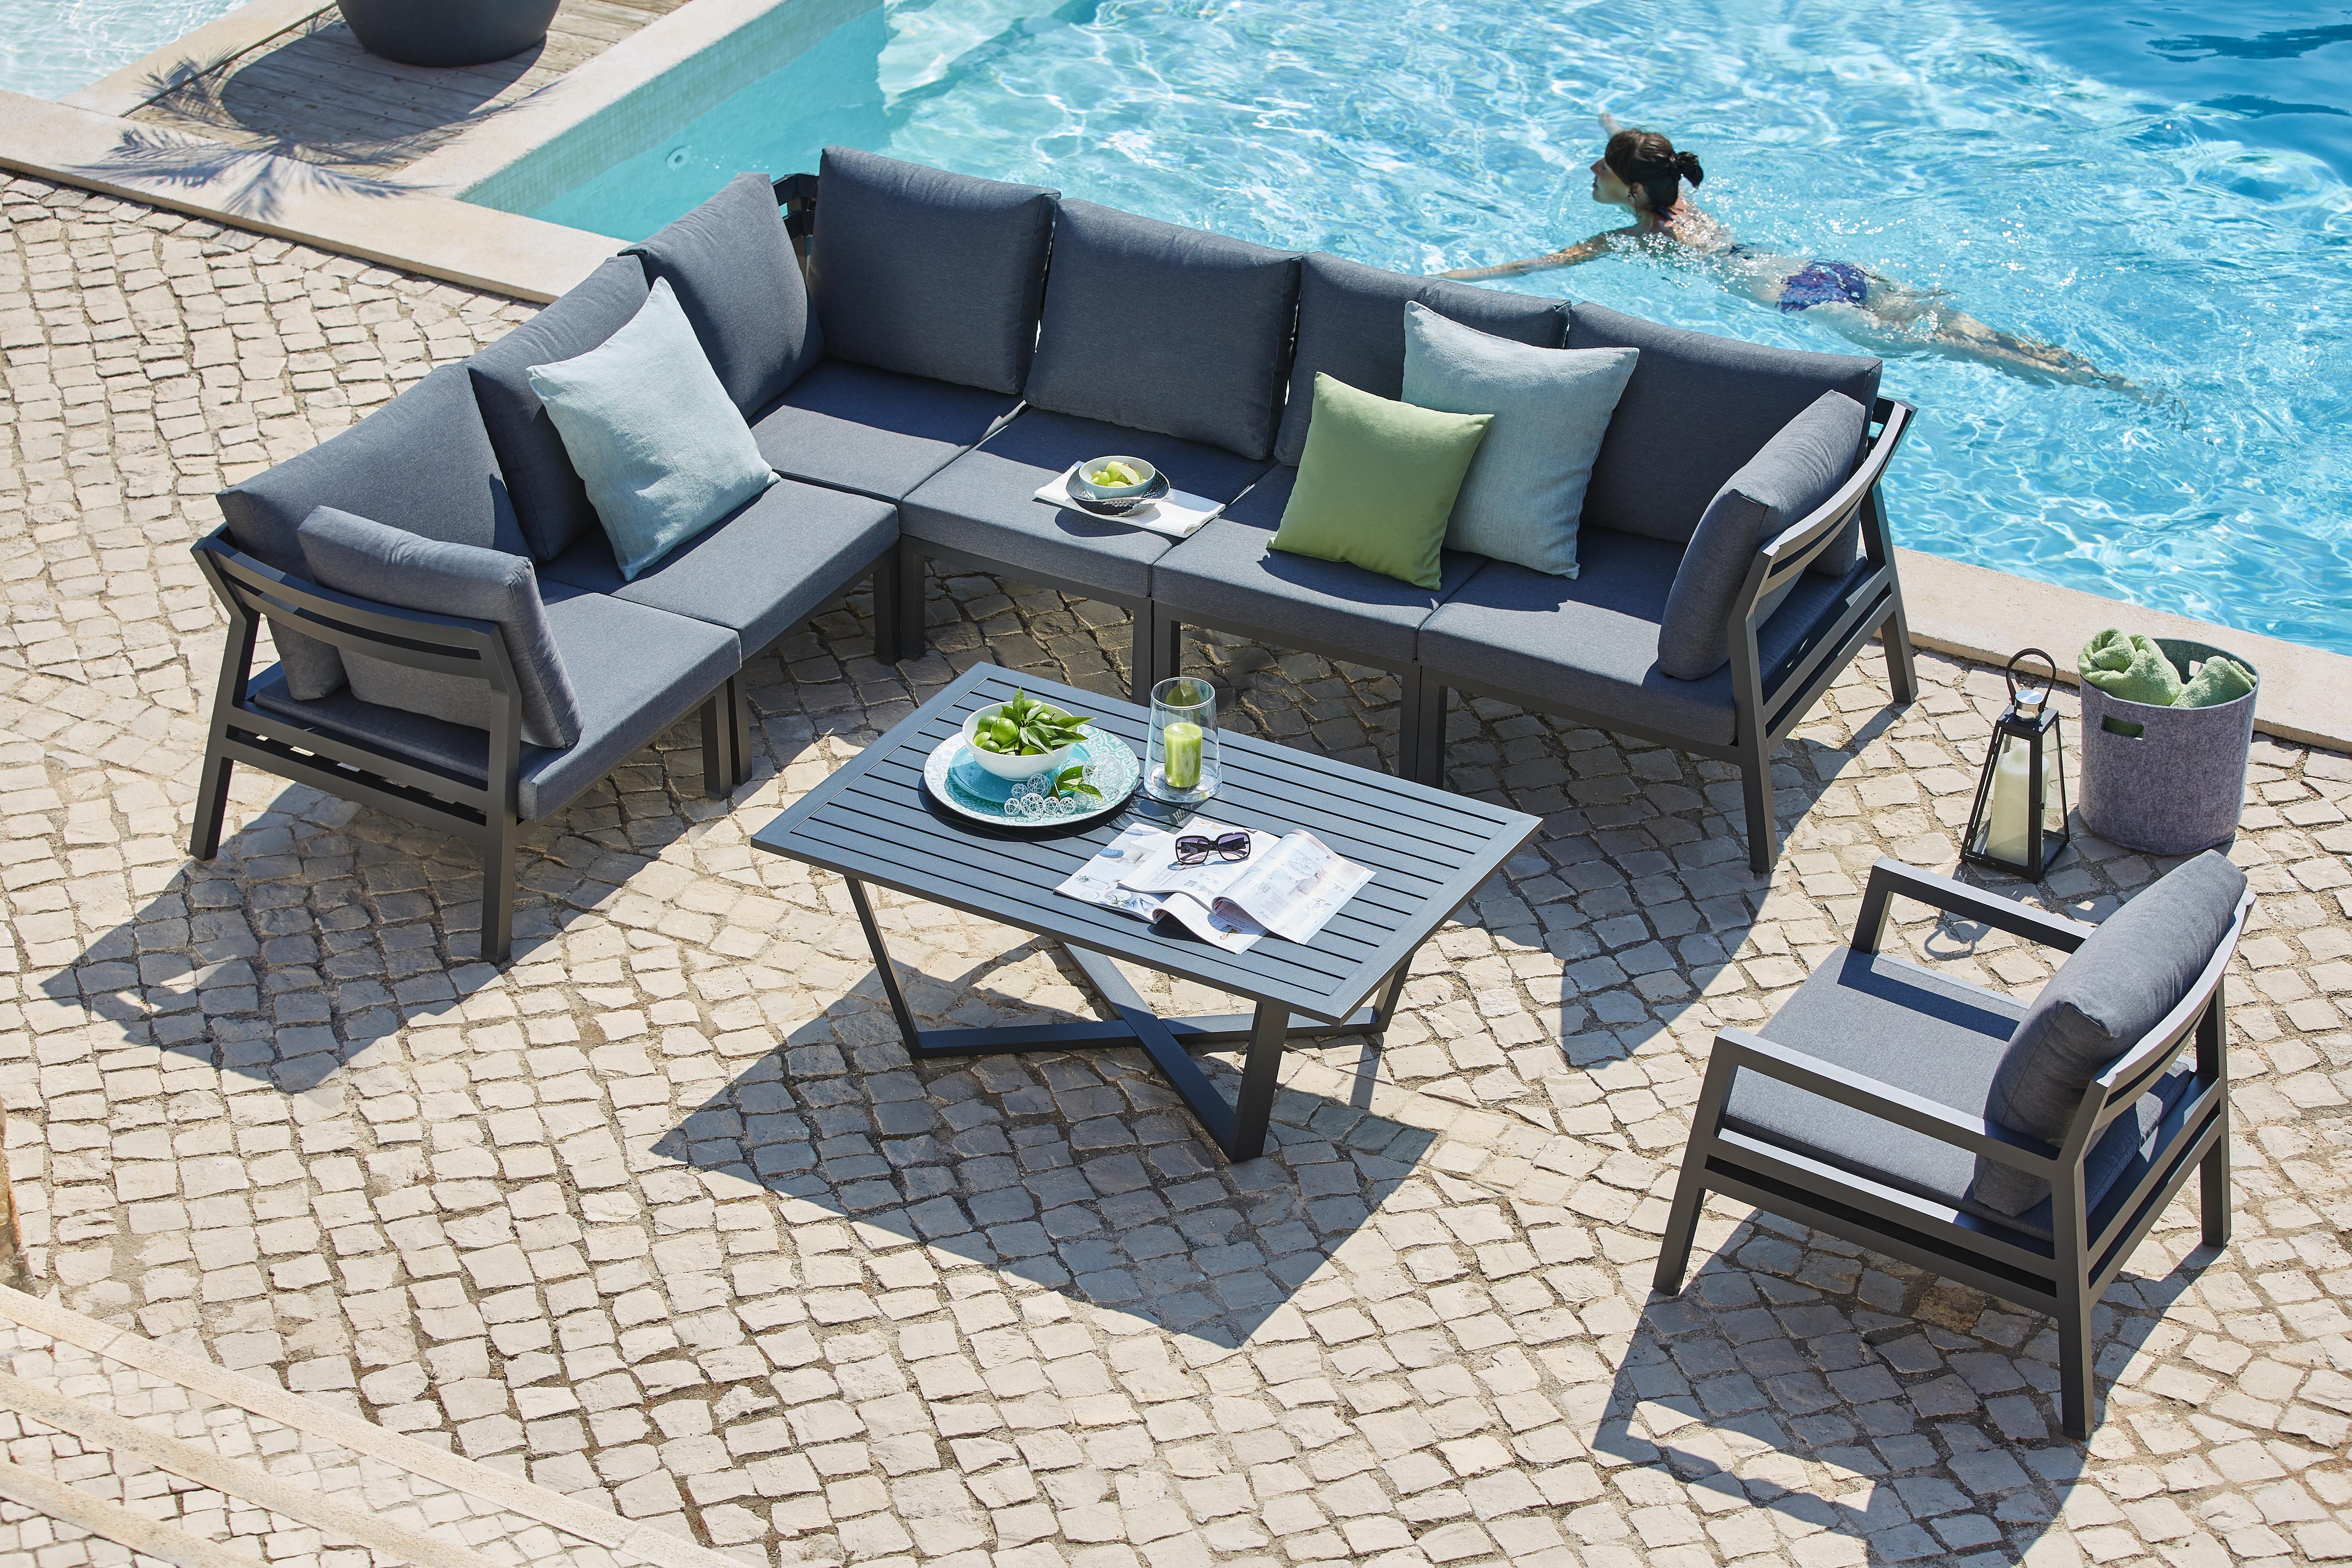 Moderne Gartenlounge Aus Metall Mit Polster Garten Lounge Aussenmobel Lounge